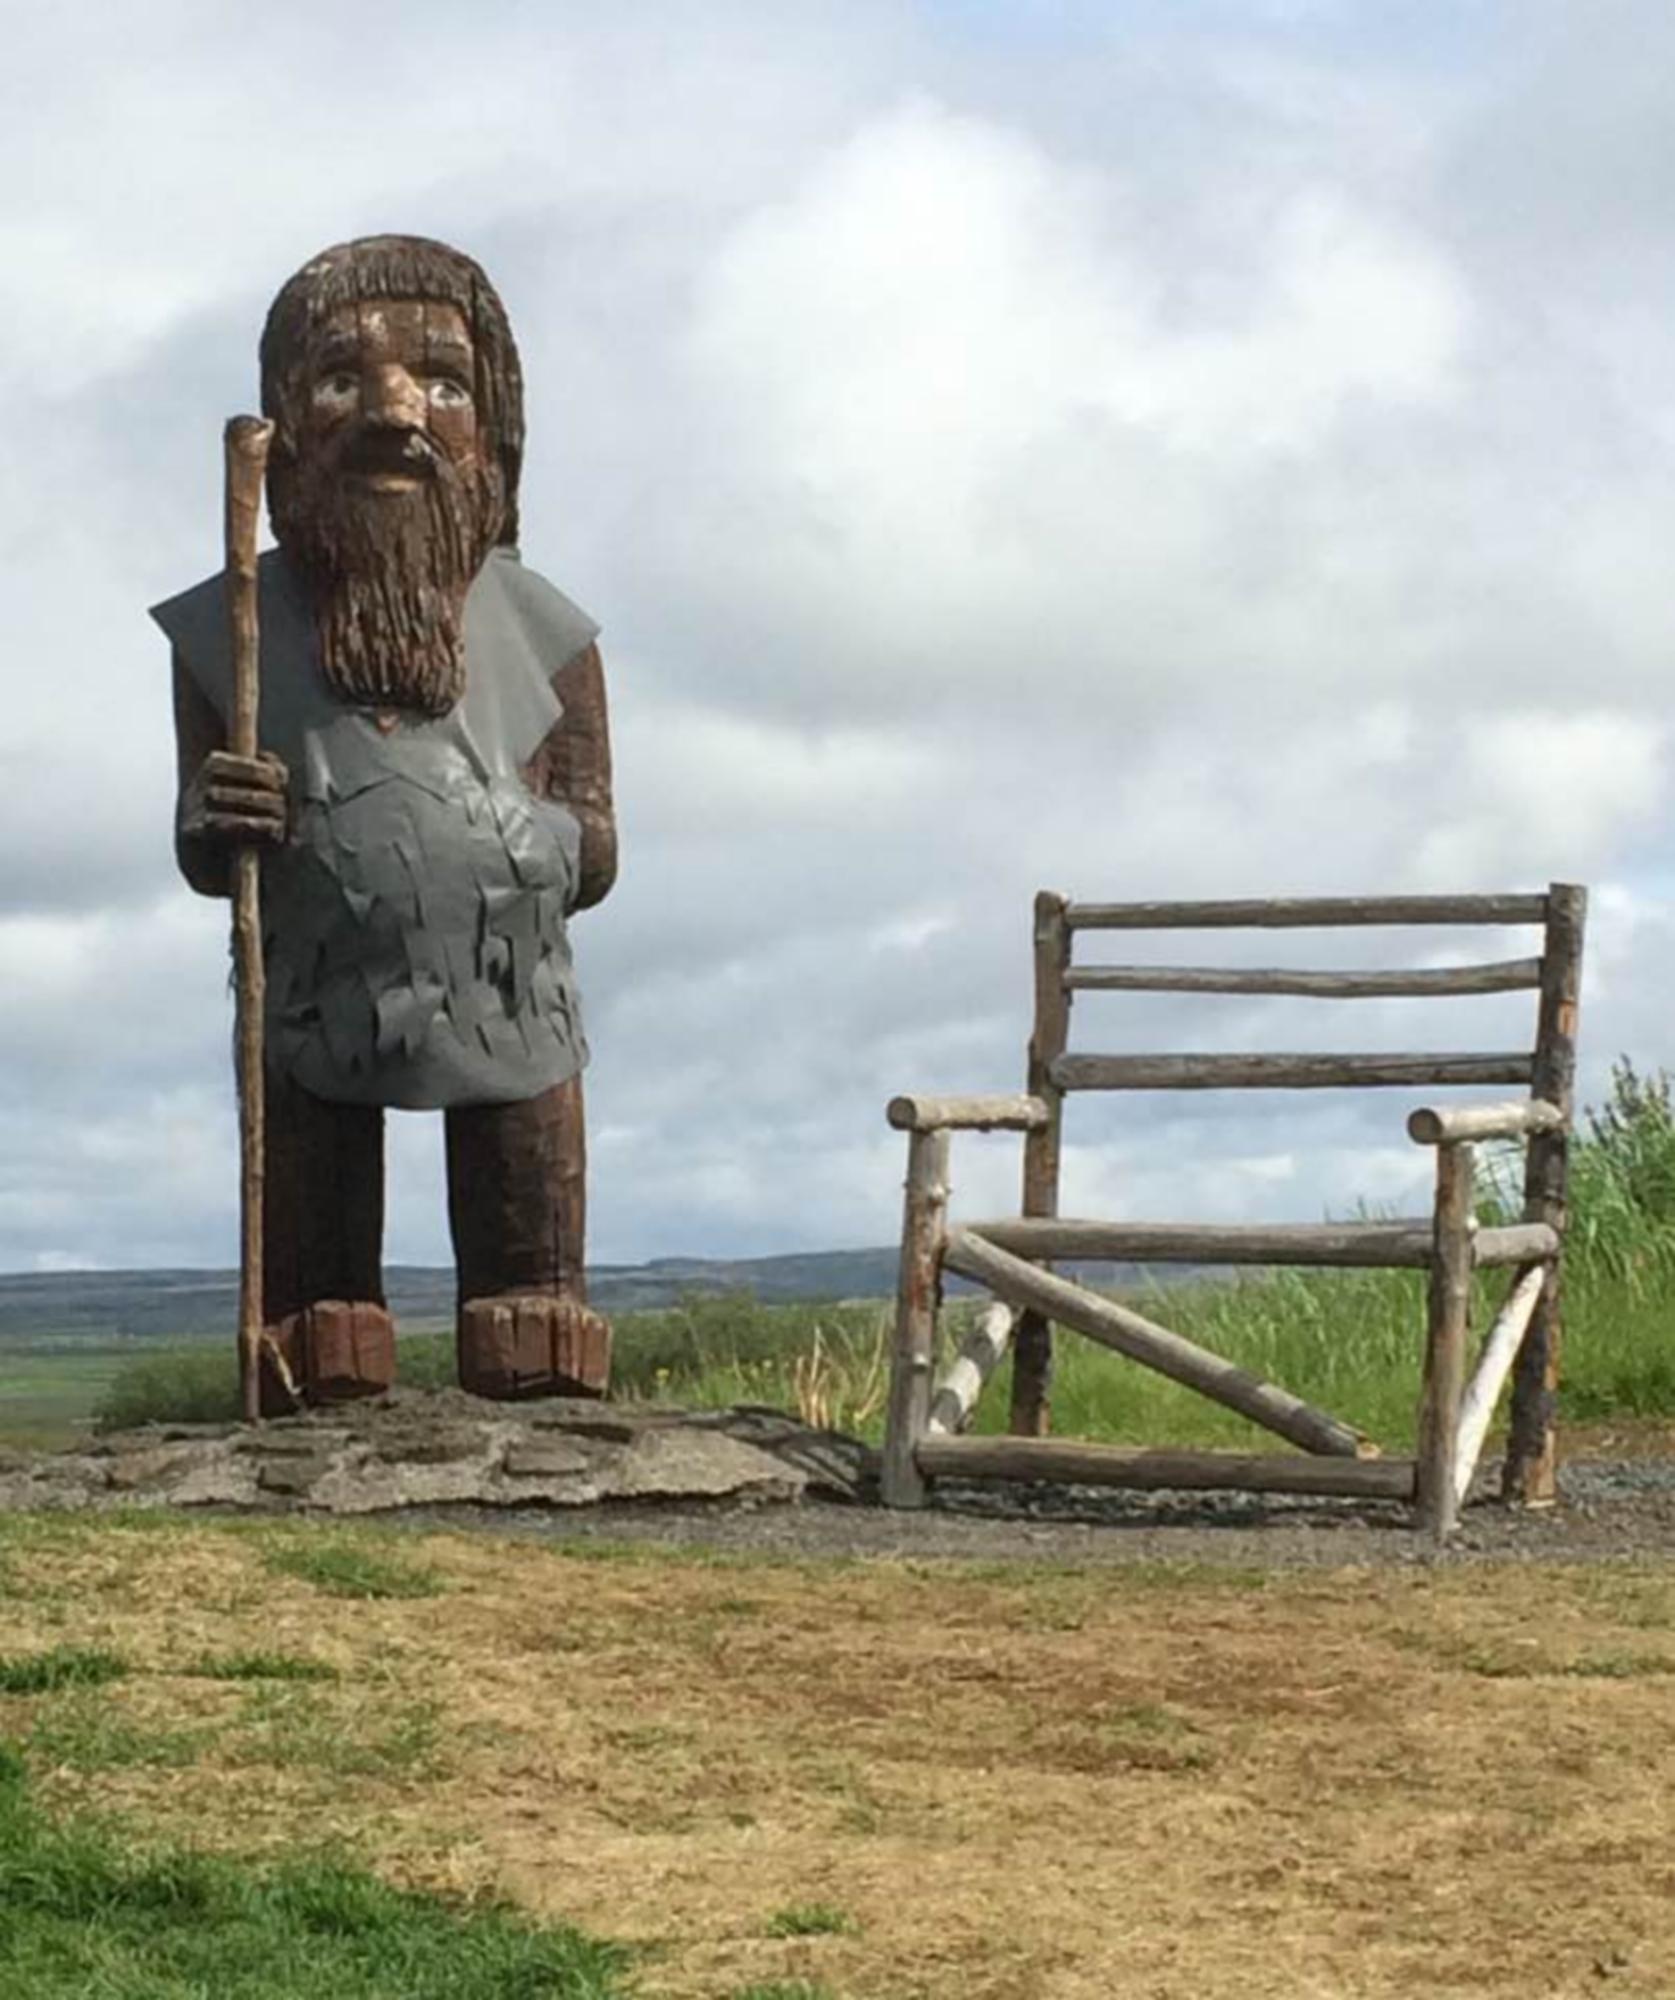 IcelandicTroll.jpg